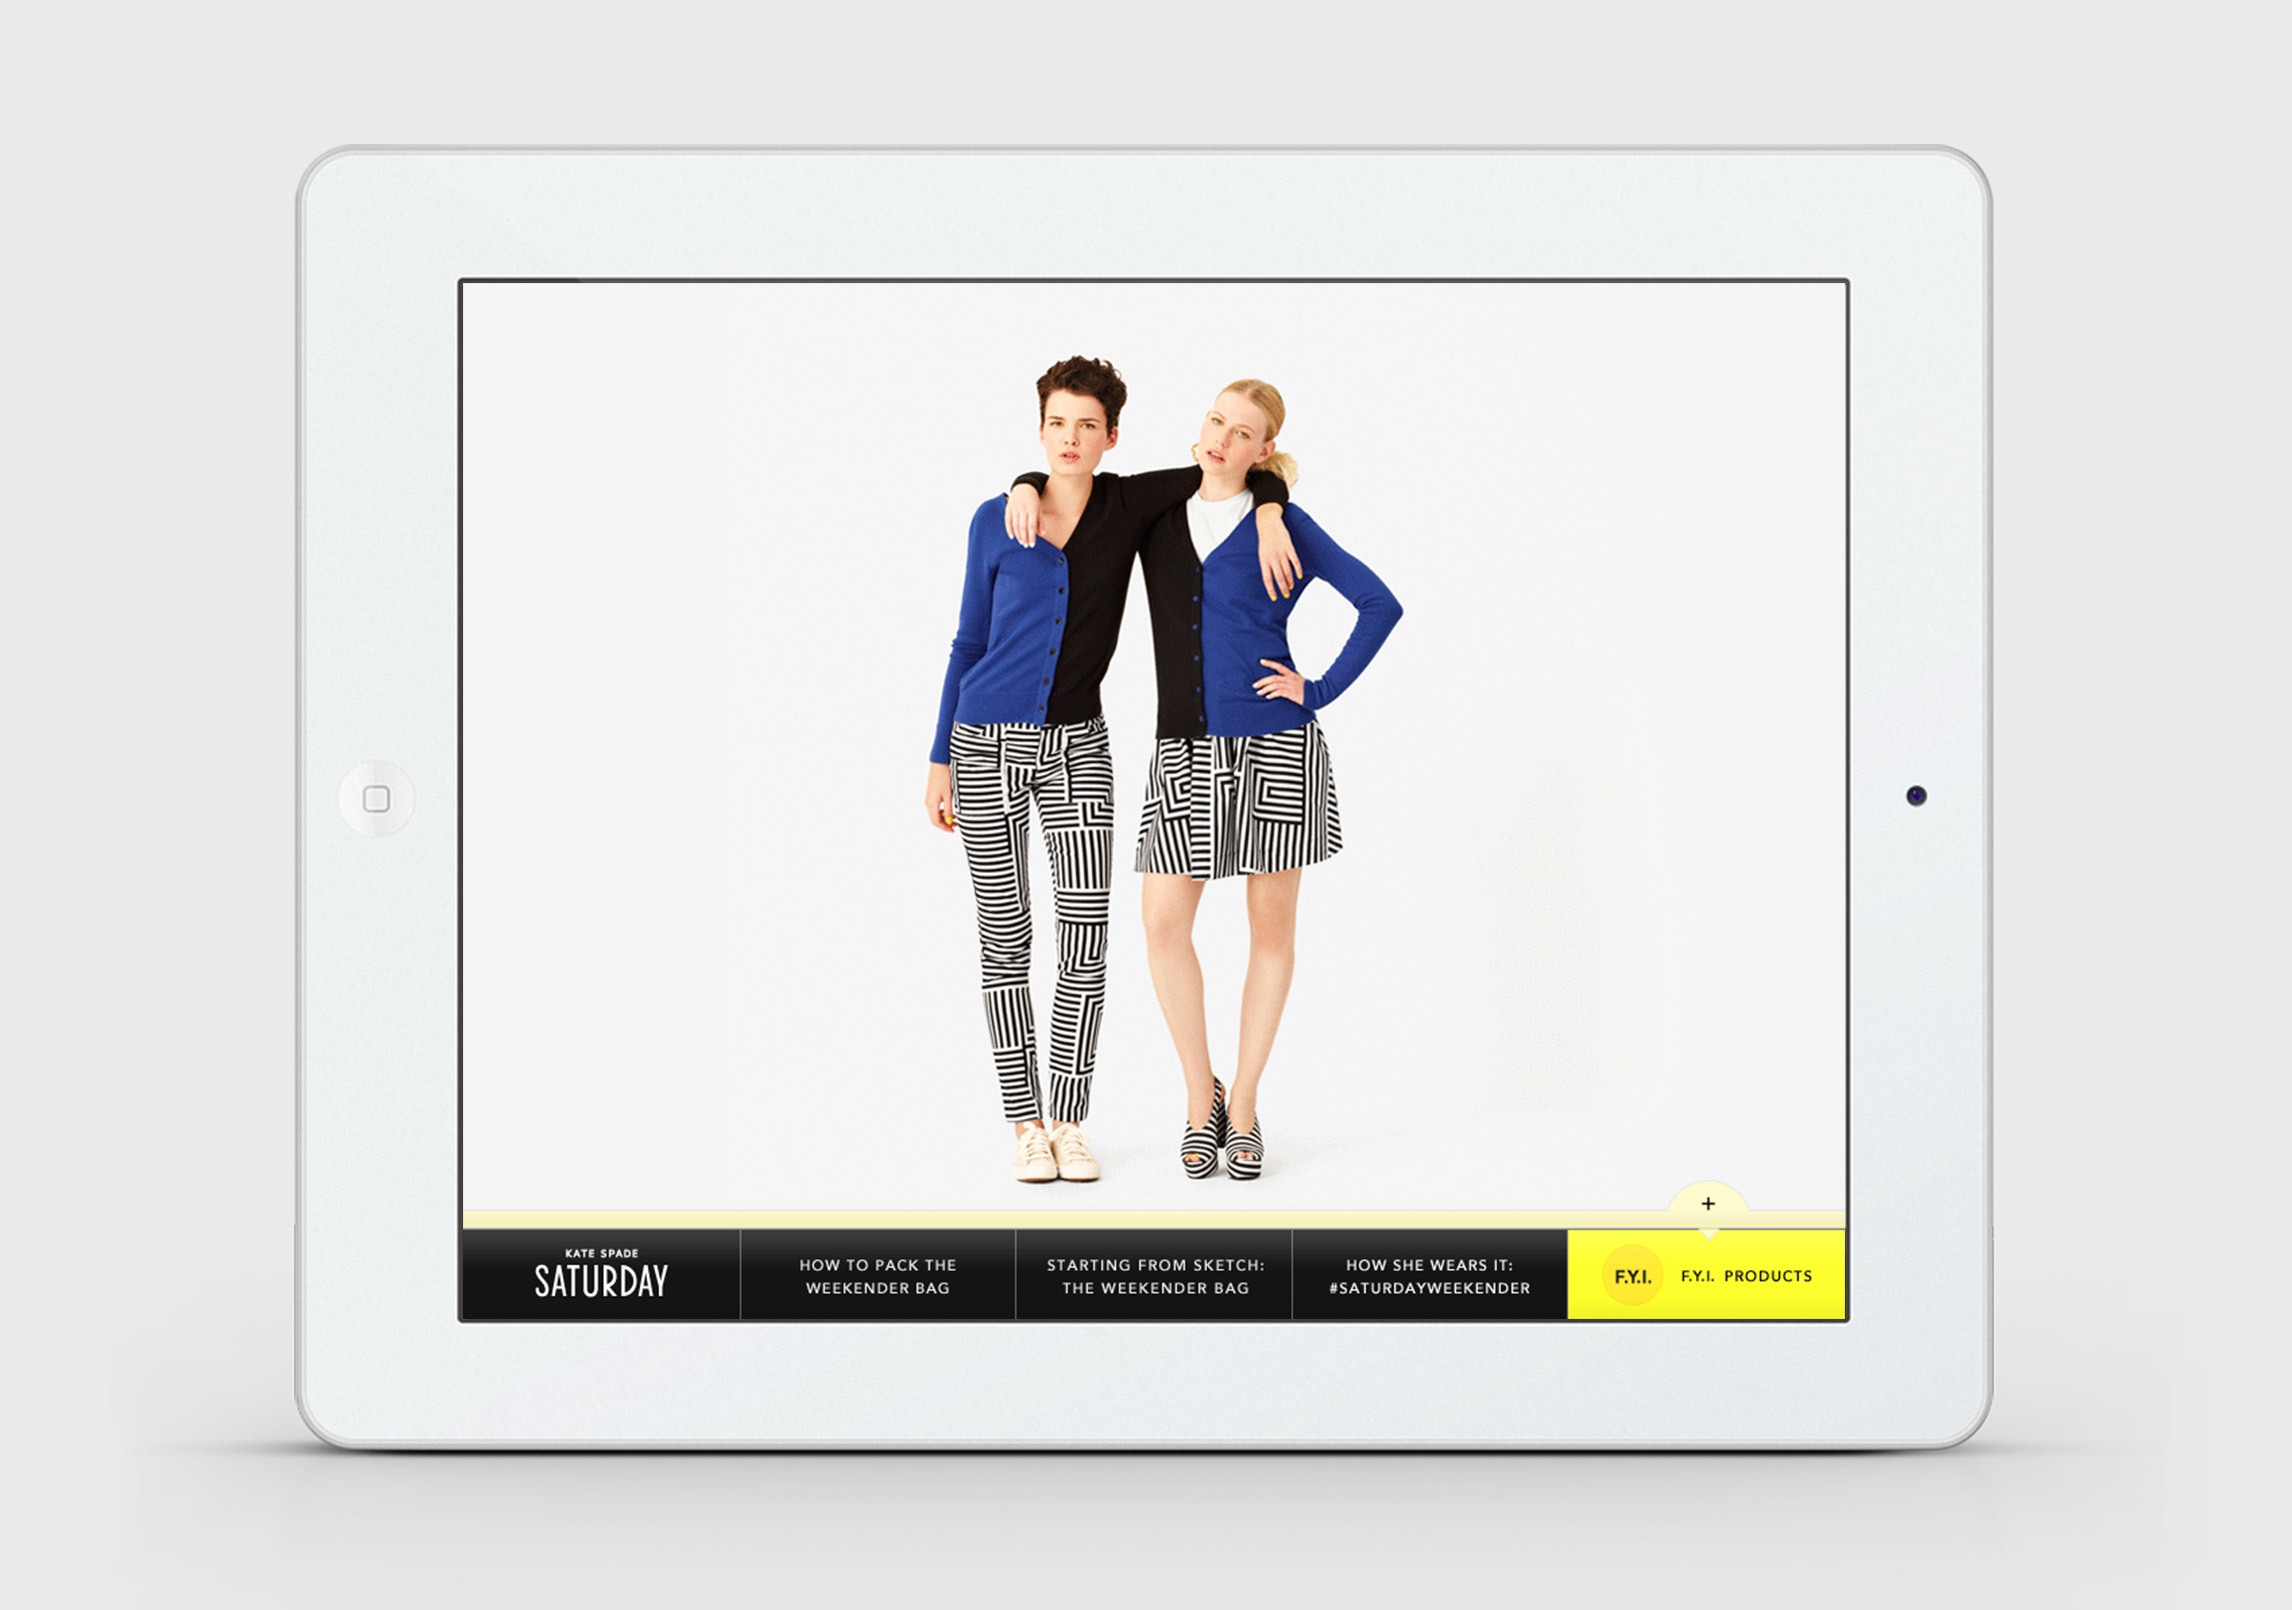 KSS_iPad_05.jpg